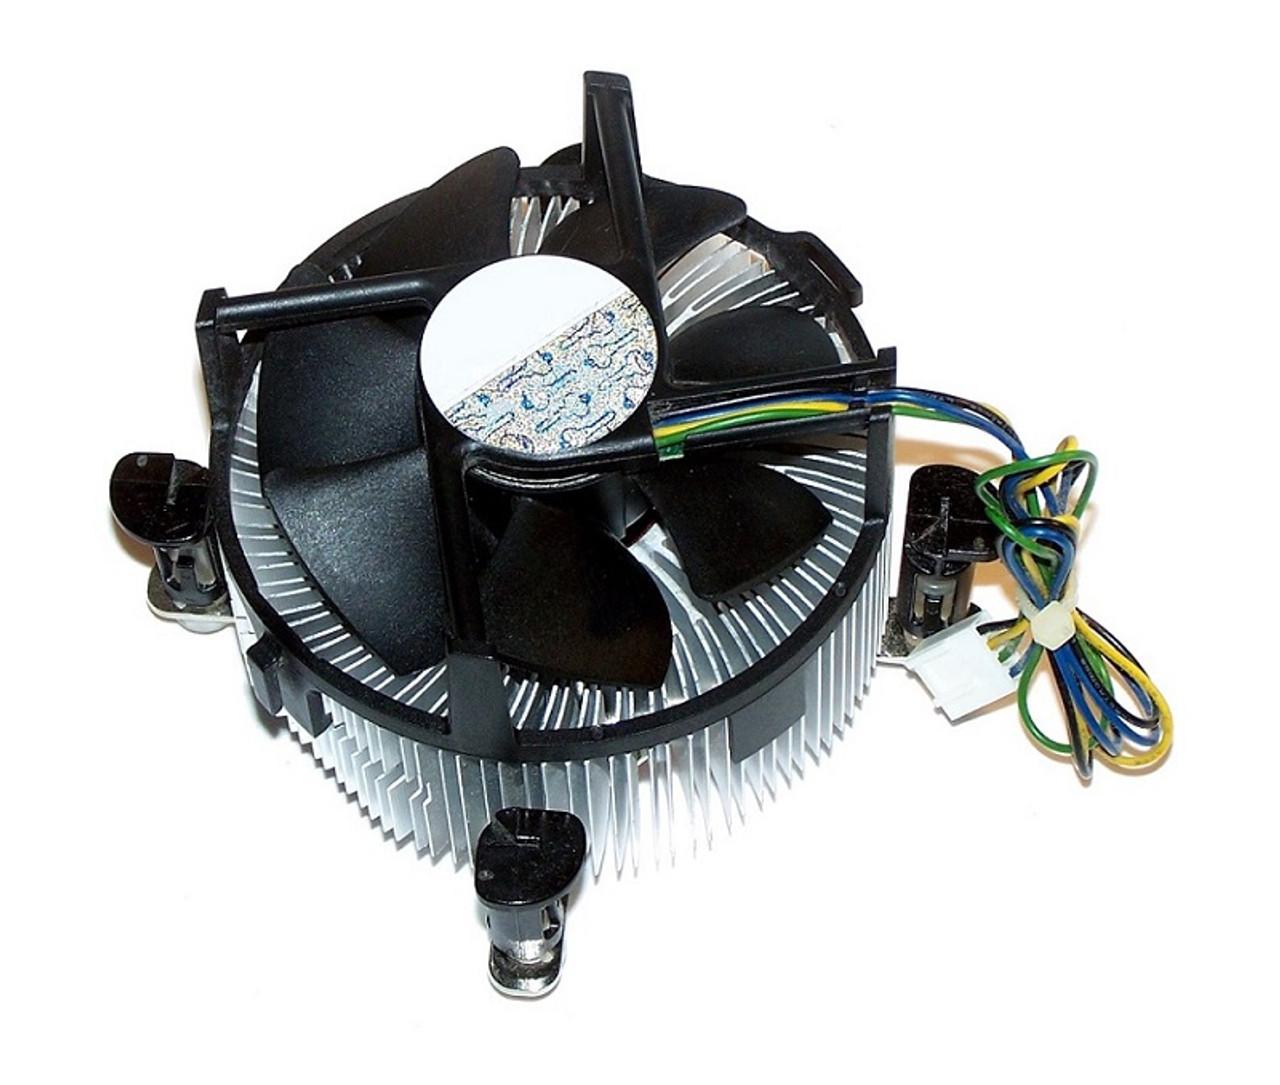 Dell 0P281K P281K for  XPS 730 XPS 730X CPU Heatsink/'s Fan Replacement